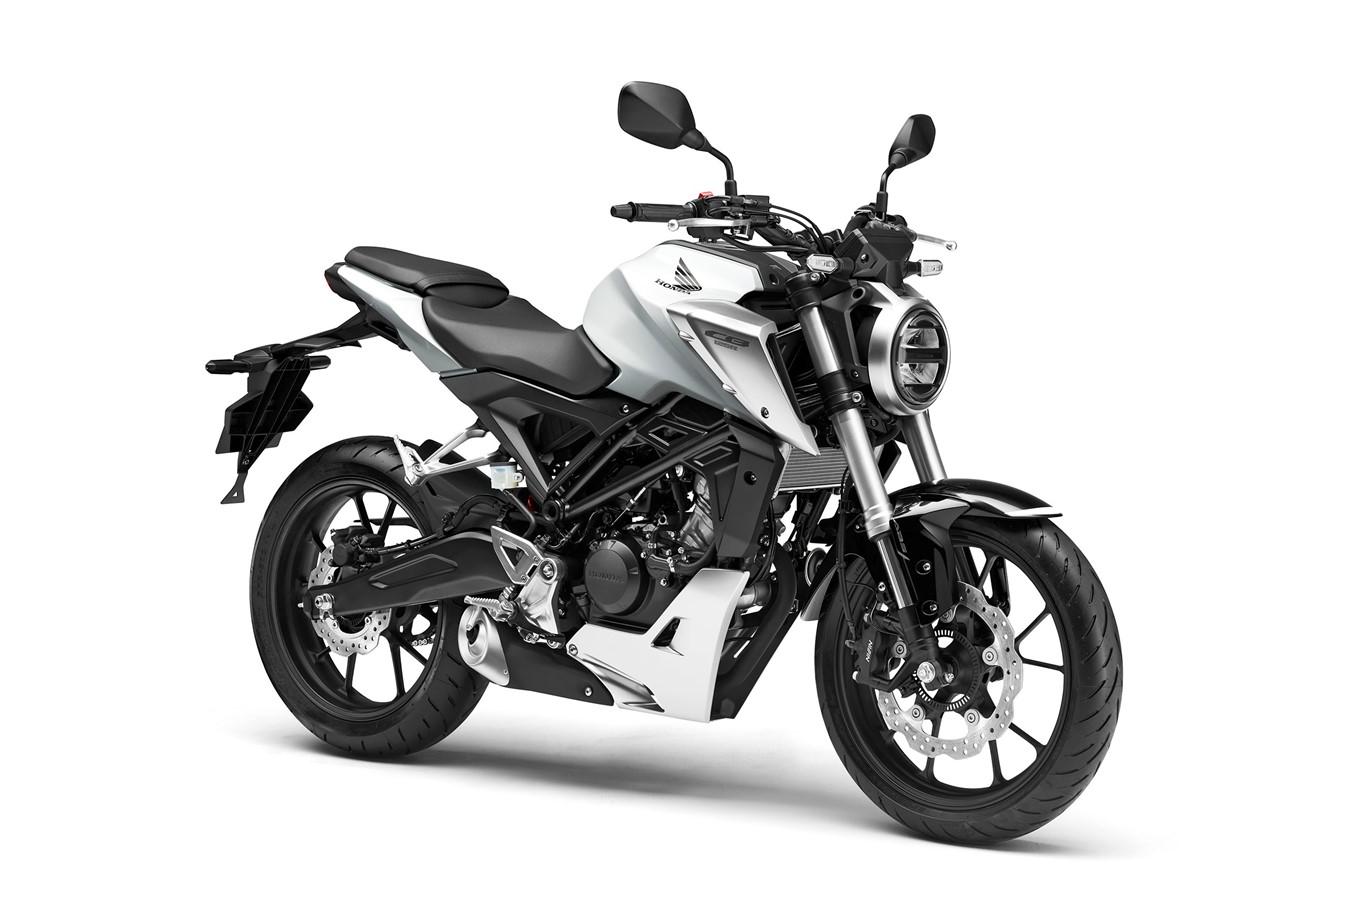 Honda 150 Motorcycles Motor Wiring Diagram Schematics 125 Motorcycle Engine 2018 Cb125r Cdi